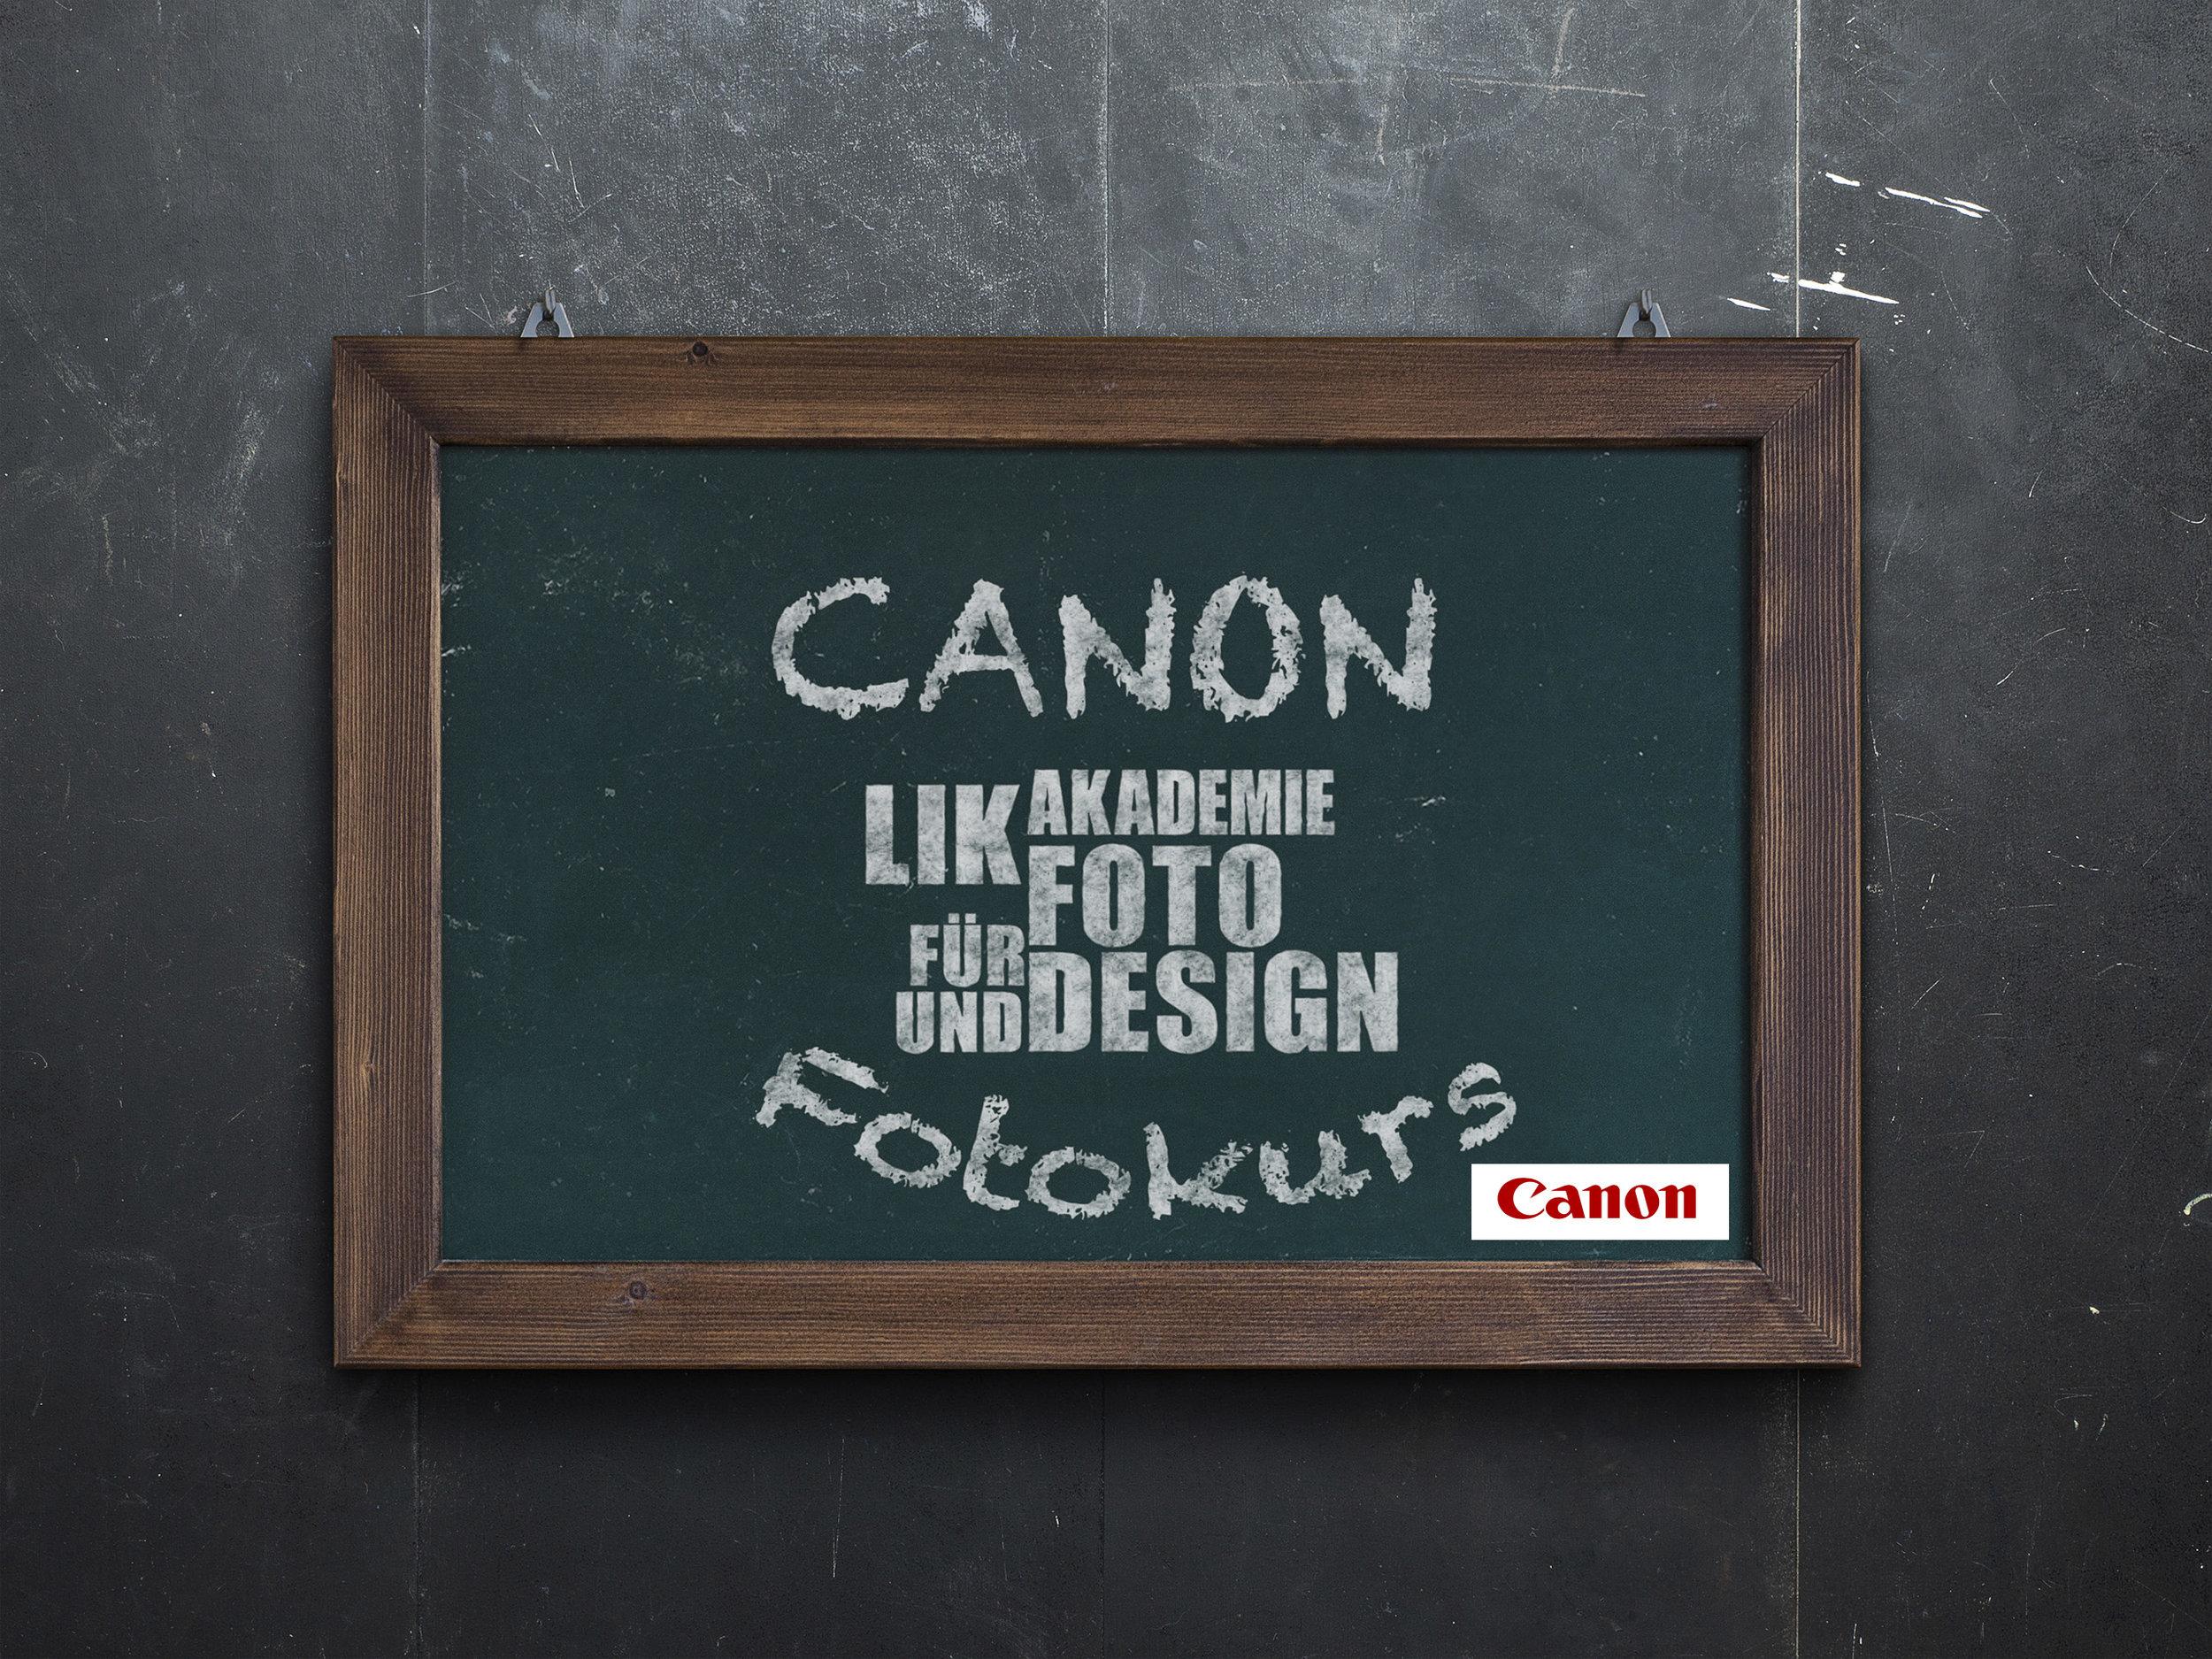 CANON - FOTOKURS